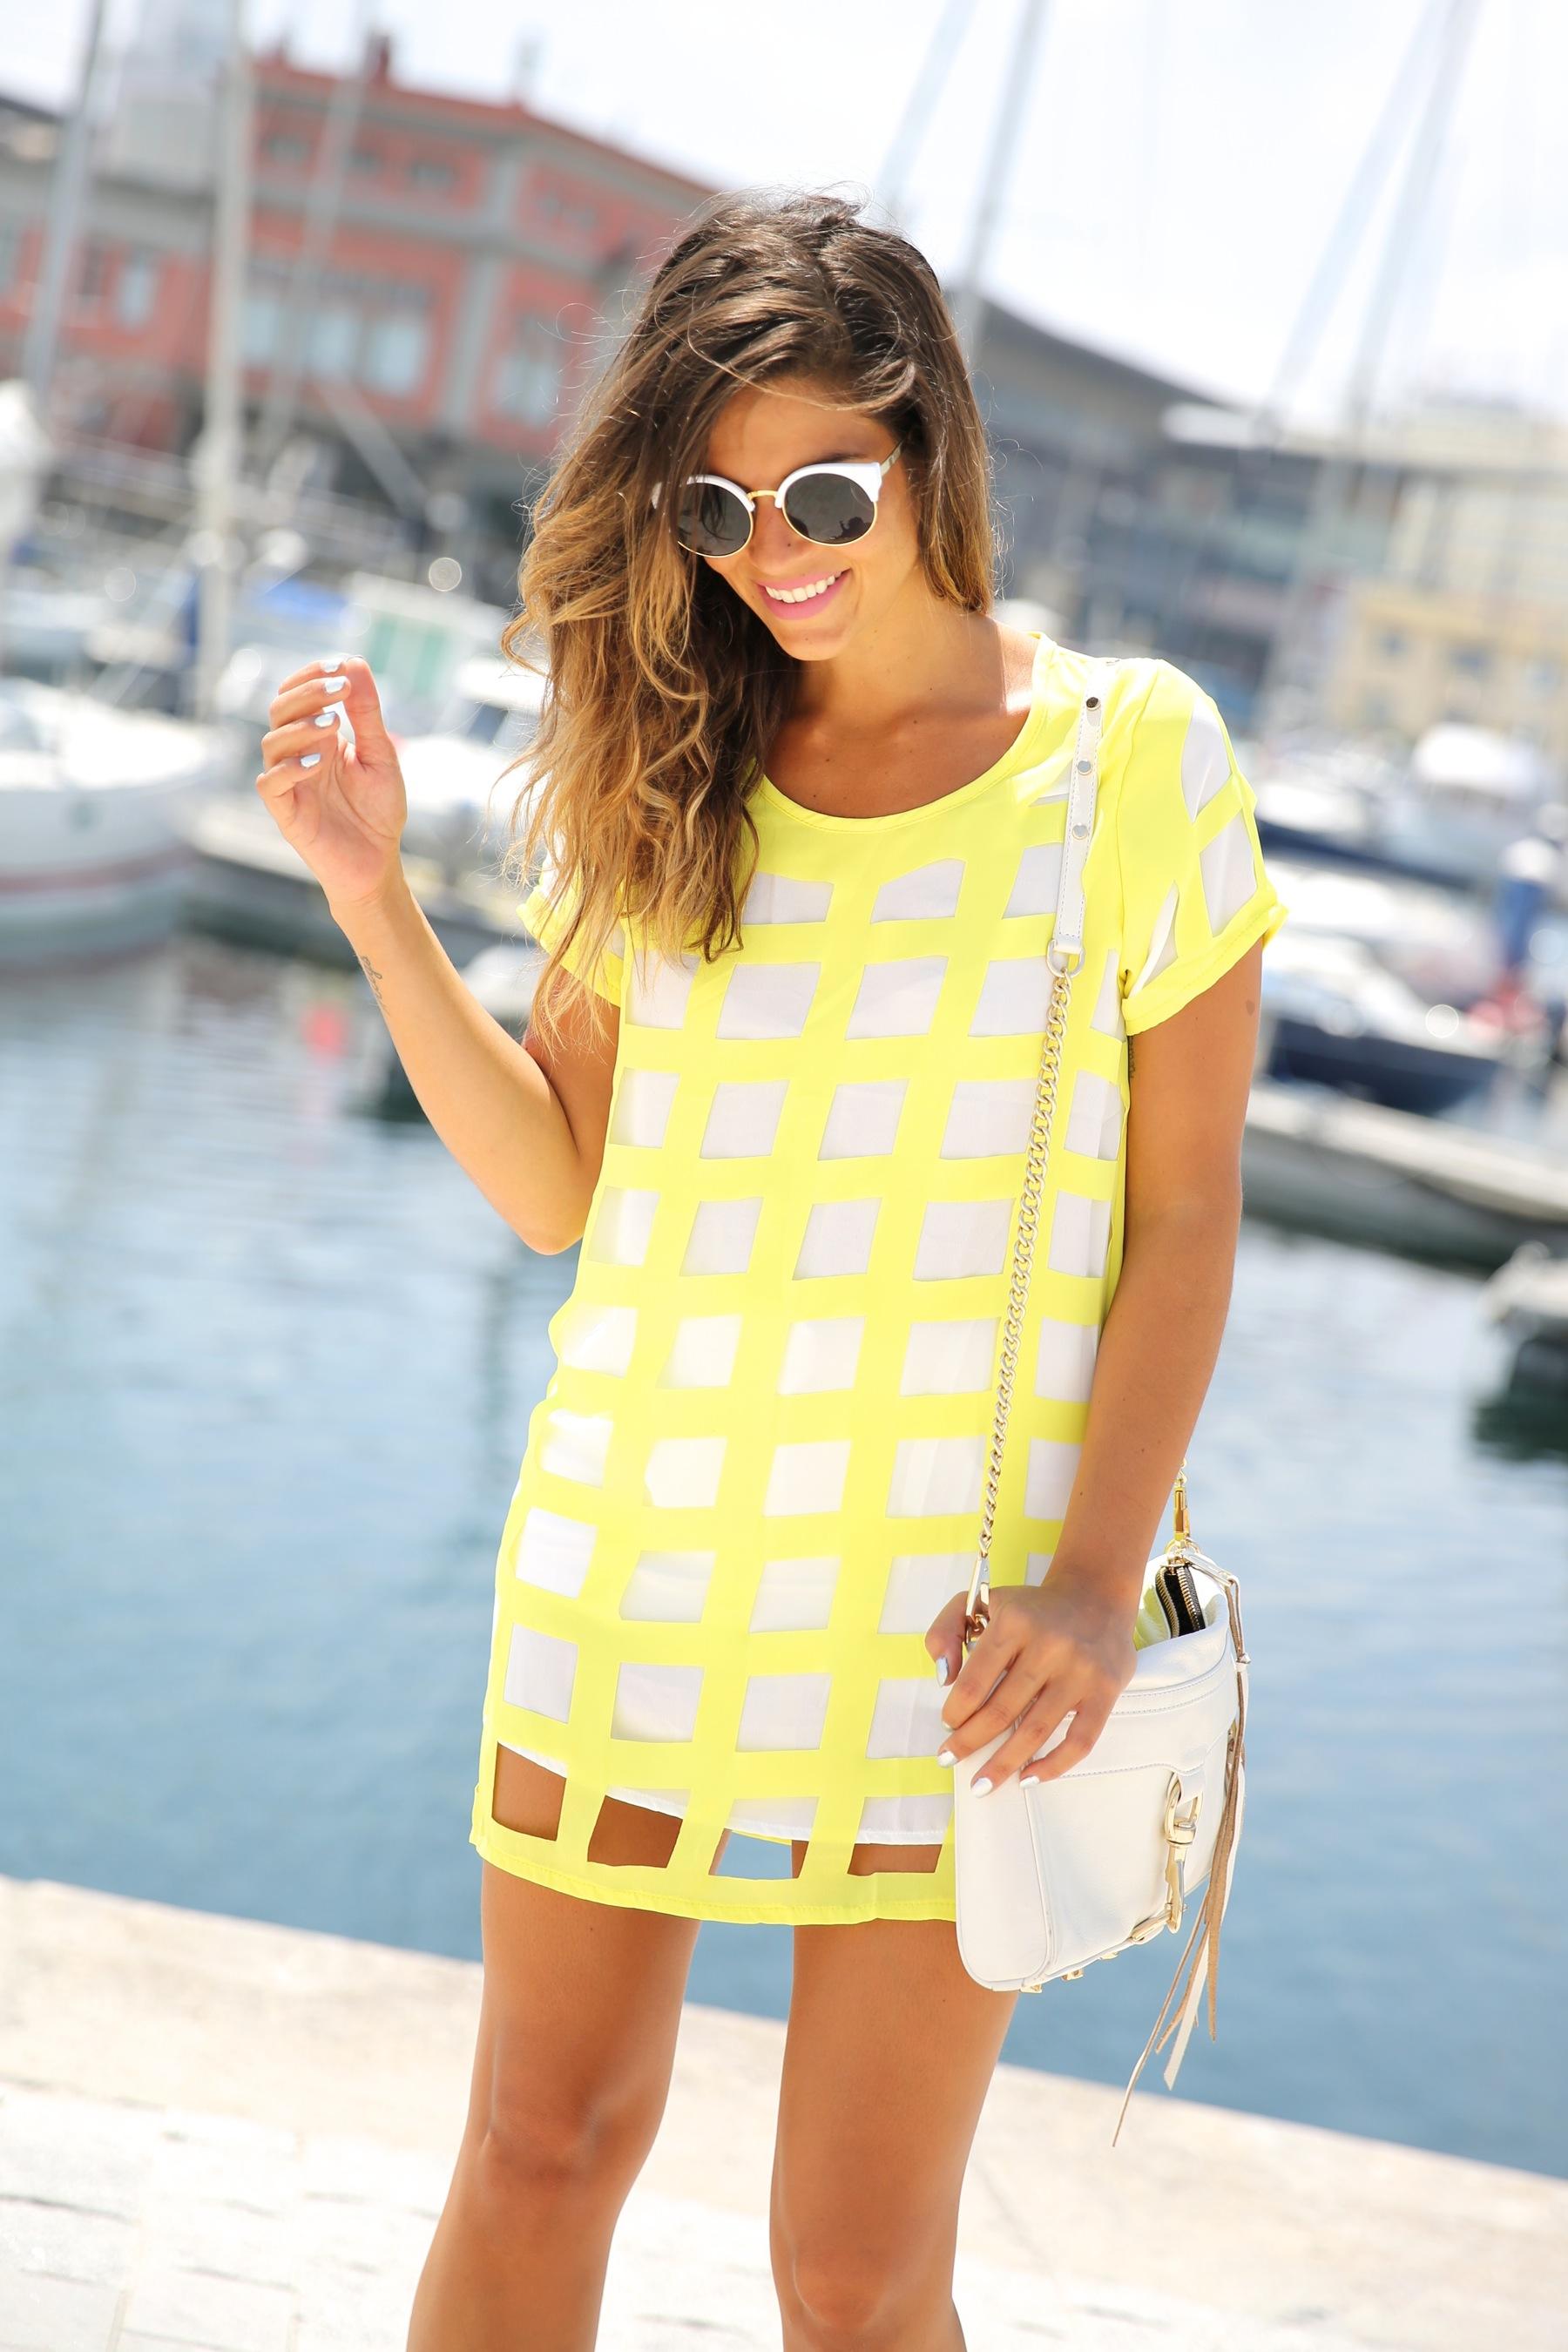 trendy_taste-look-outfit-street_style-ootd-blog-blogger-moda_españa-fashion_spain-coruña-galicia-sandalias_plataforma-platform_sandals-rebecca_minkoff-yellow-amarillo-vestido-dress-plaid-cuadros-6